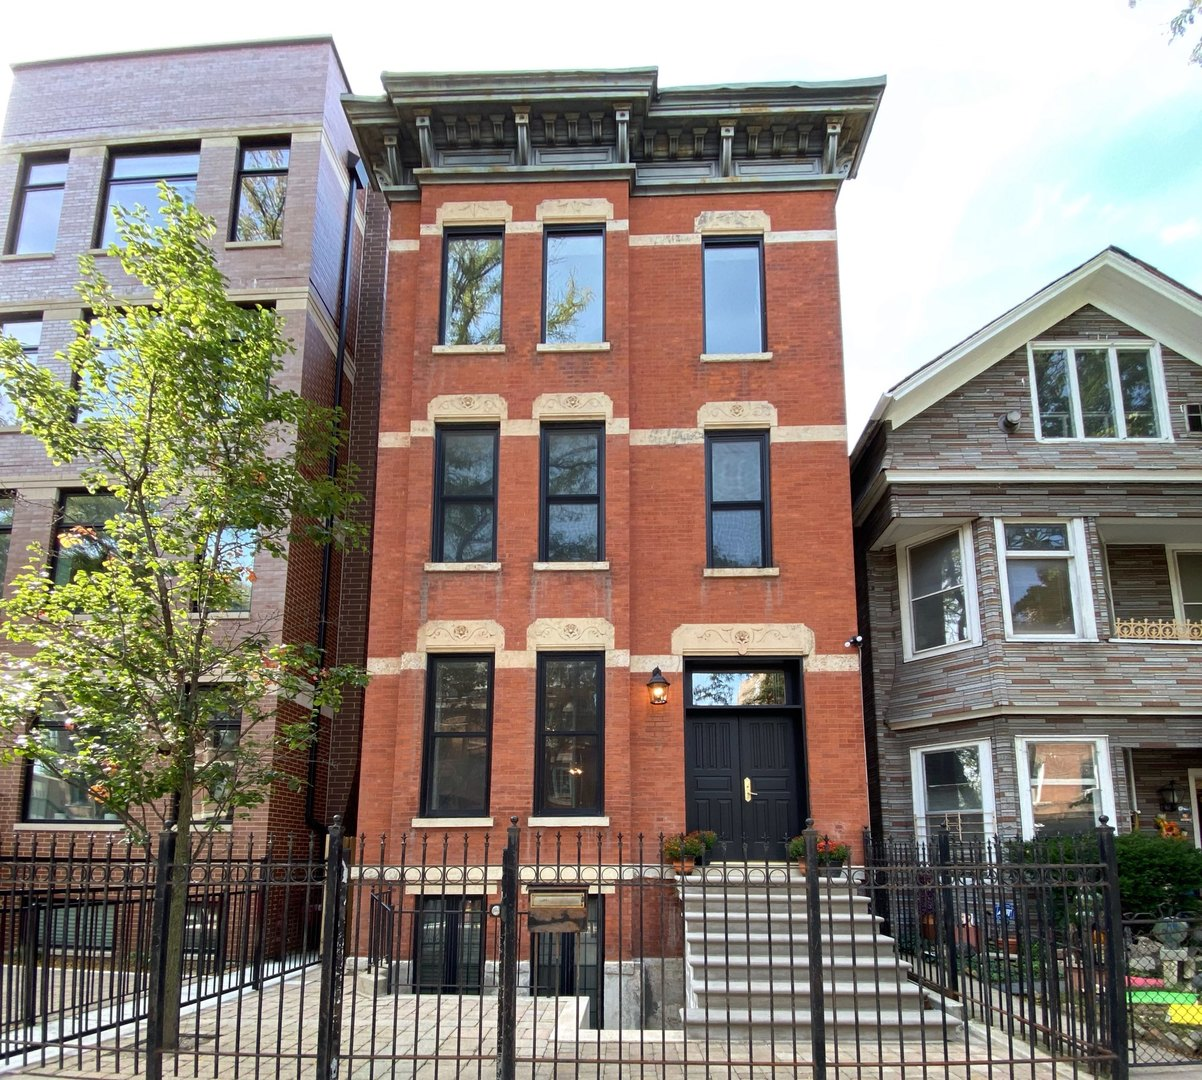 1932 N Sedgwick Street, Chicago IL 60614